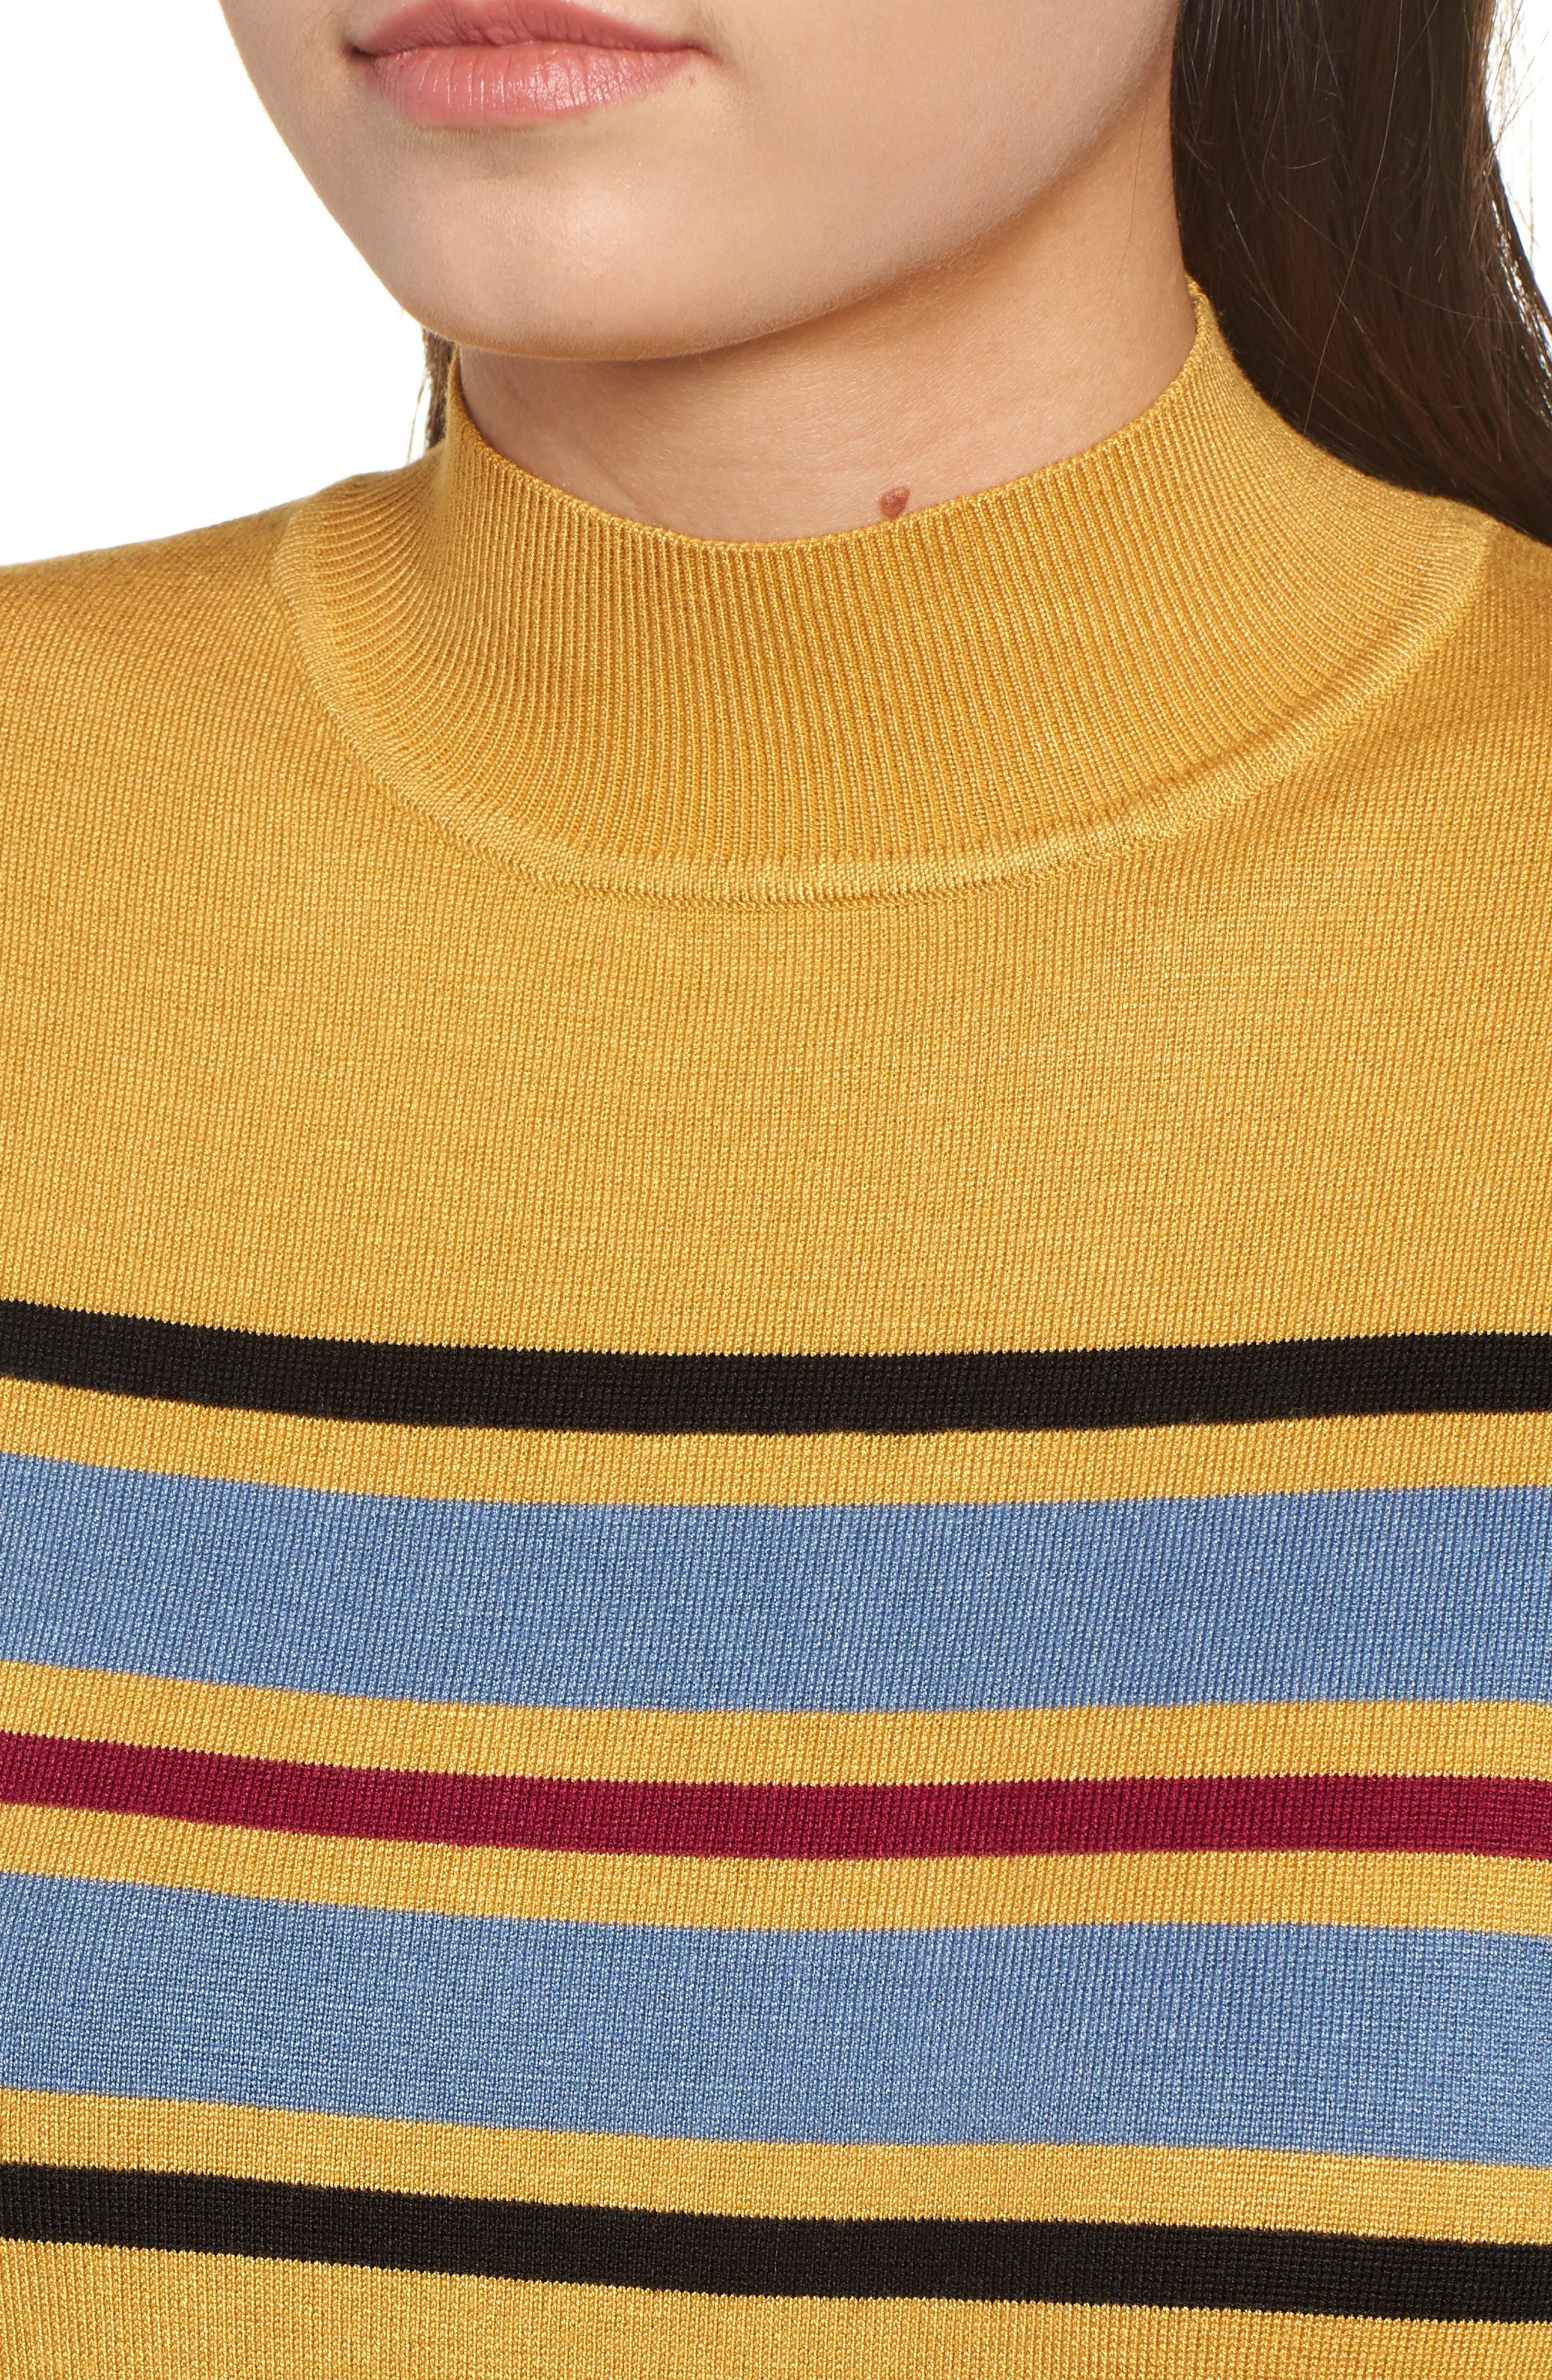 Skivvy Stripe Sweater,                             Alternate thumbnail 4, color,                             MUSTARD